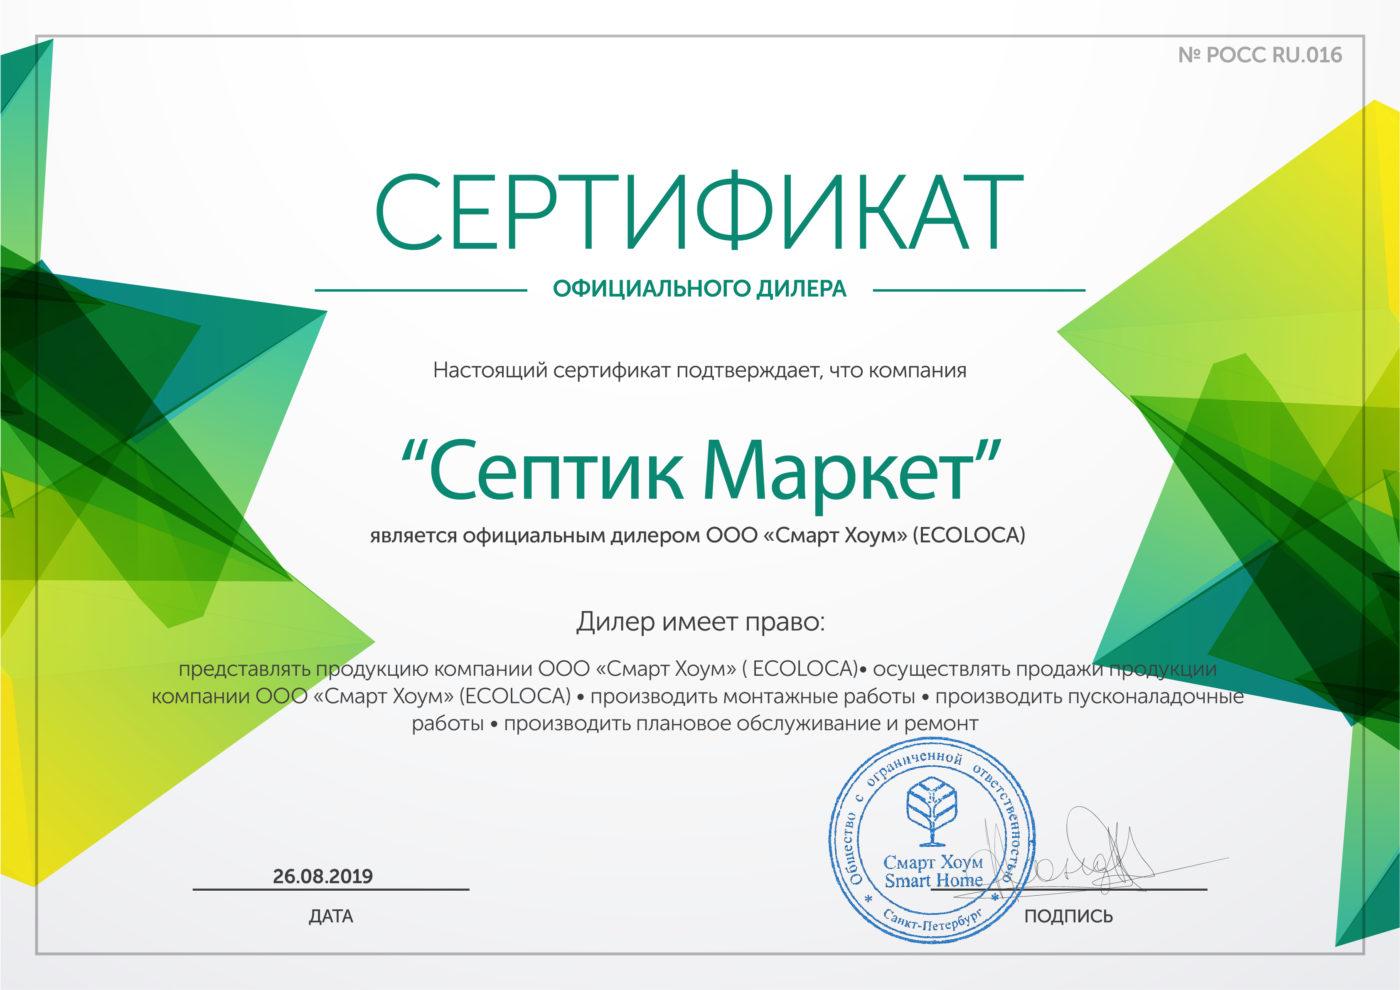 сертификат дилера Эколока